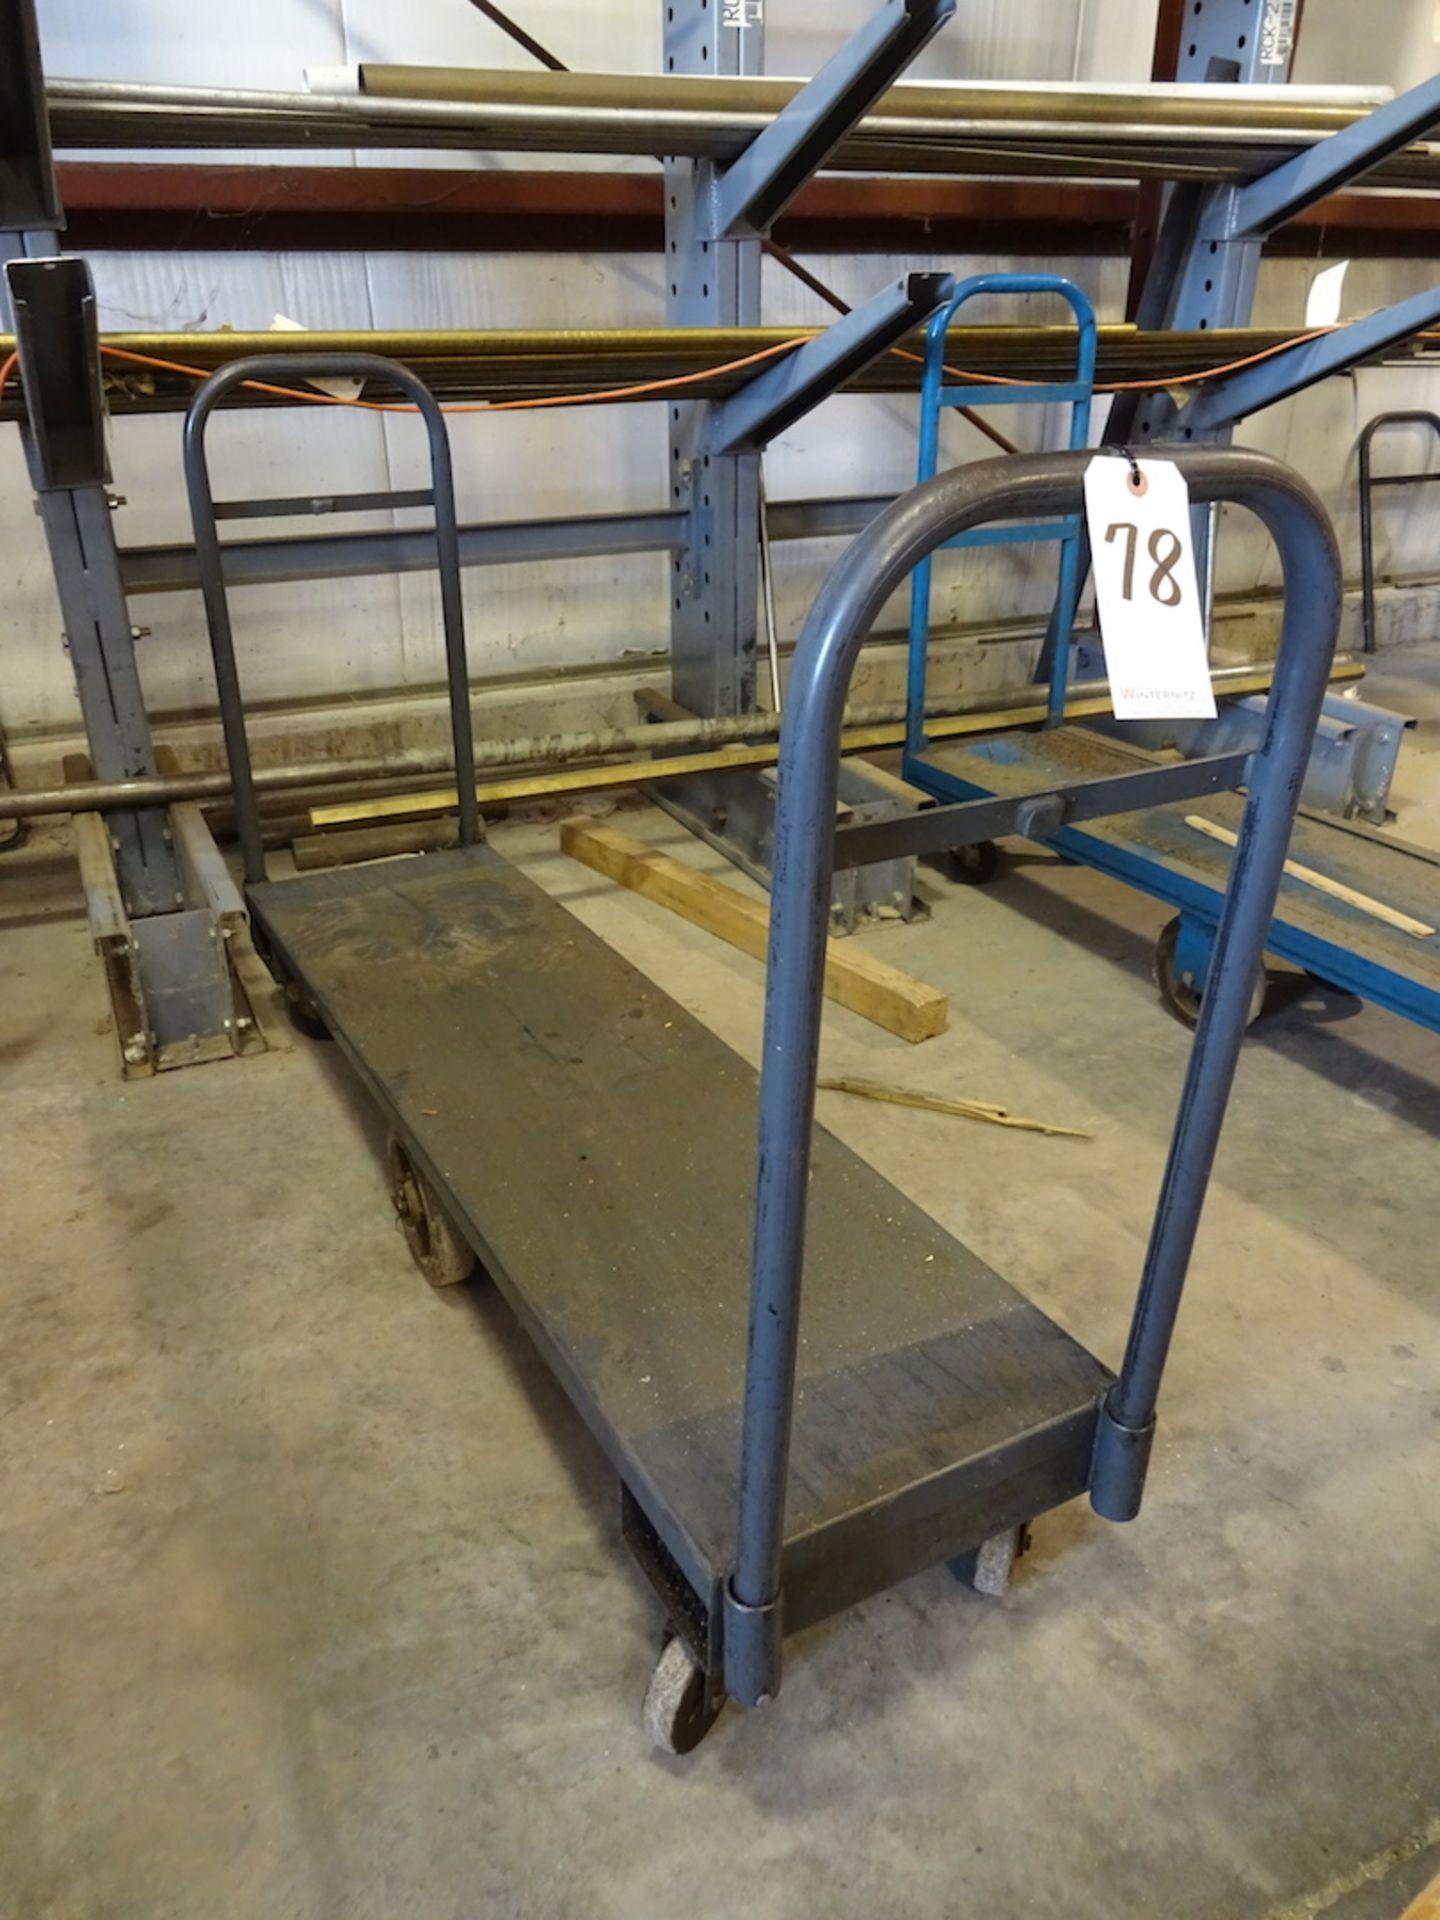 Lot 78 - 60 in. x 16 in. Shop Cart